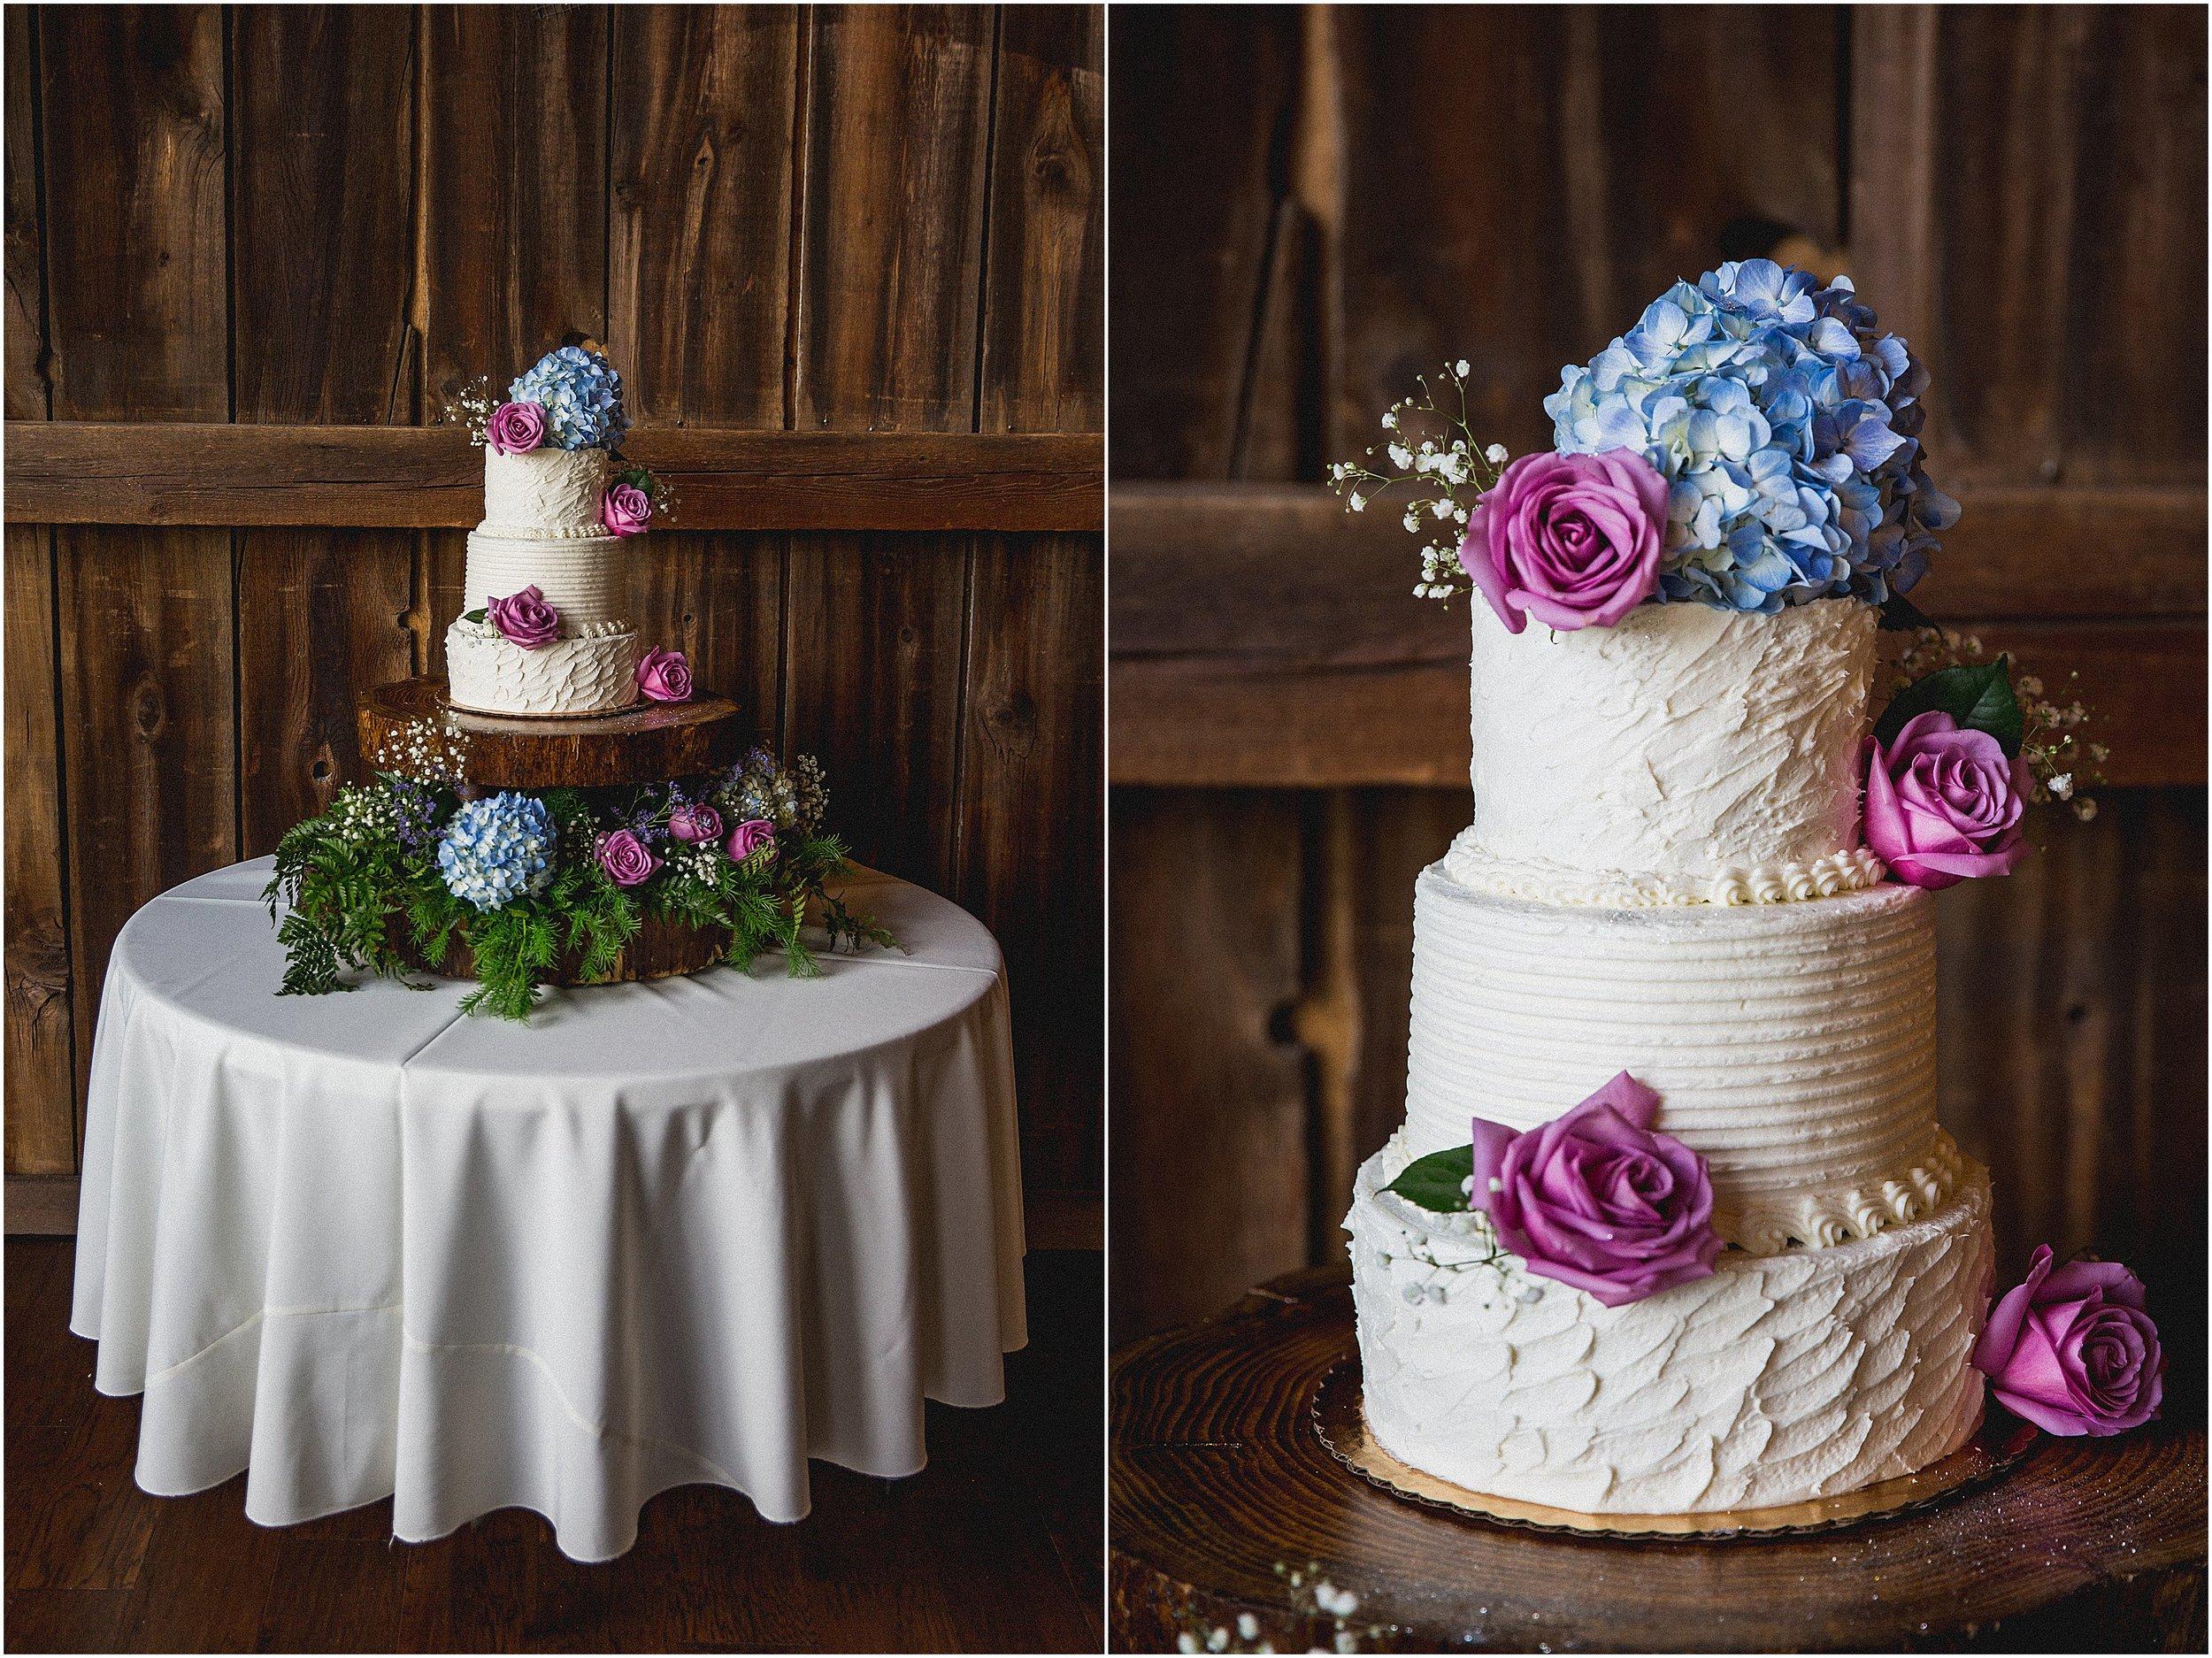 Frosty_Valley_Wedding_Photographer_0354.jpg